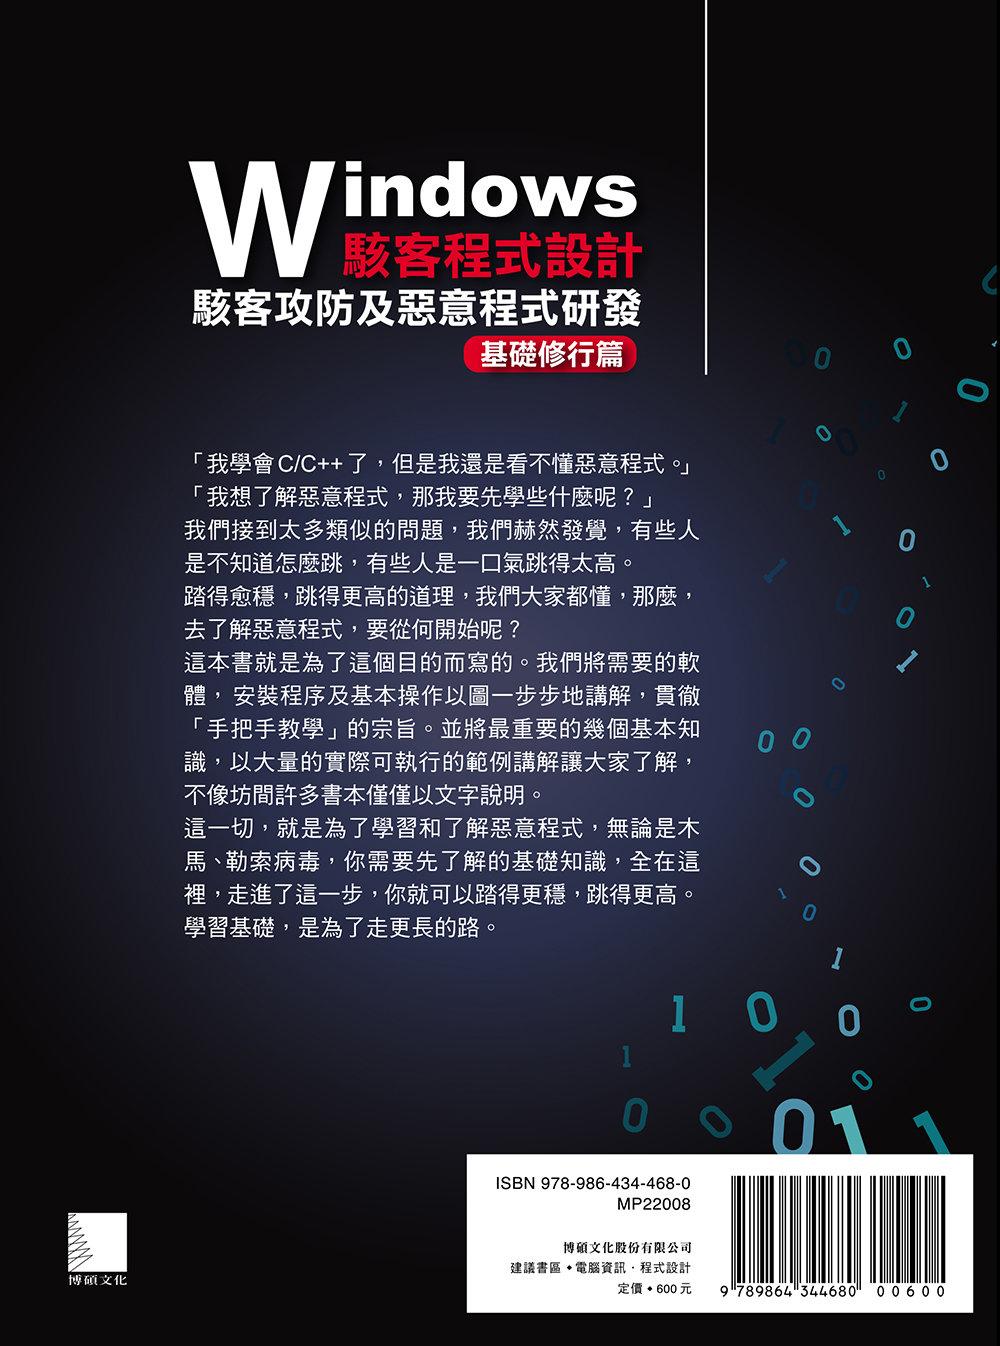 Windows 駭客程式設計:駭客攻防及惡意程式研發 (基礎修行篇)-preview-16